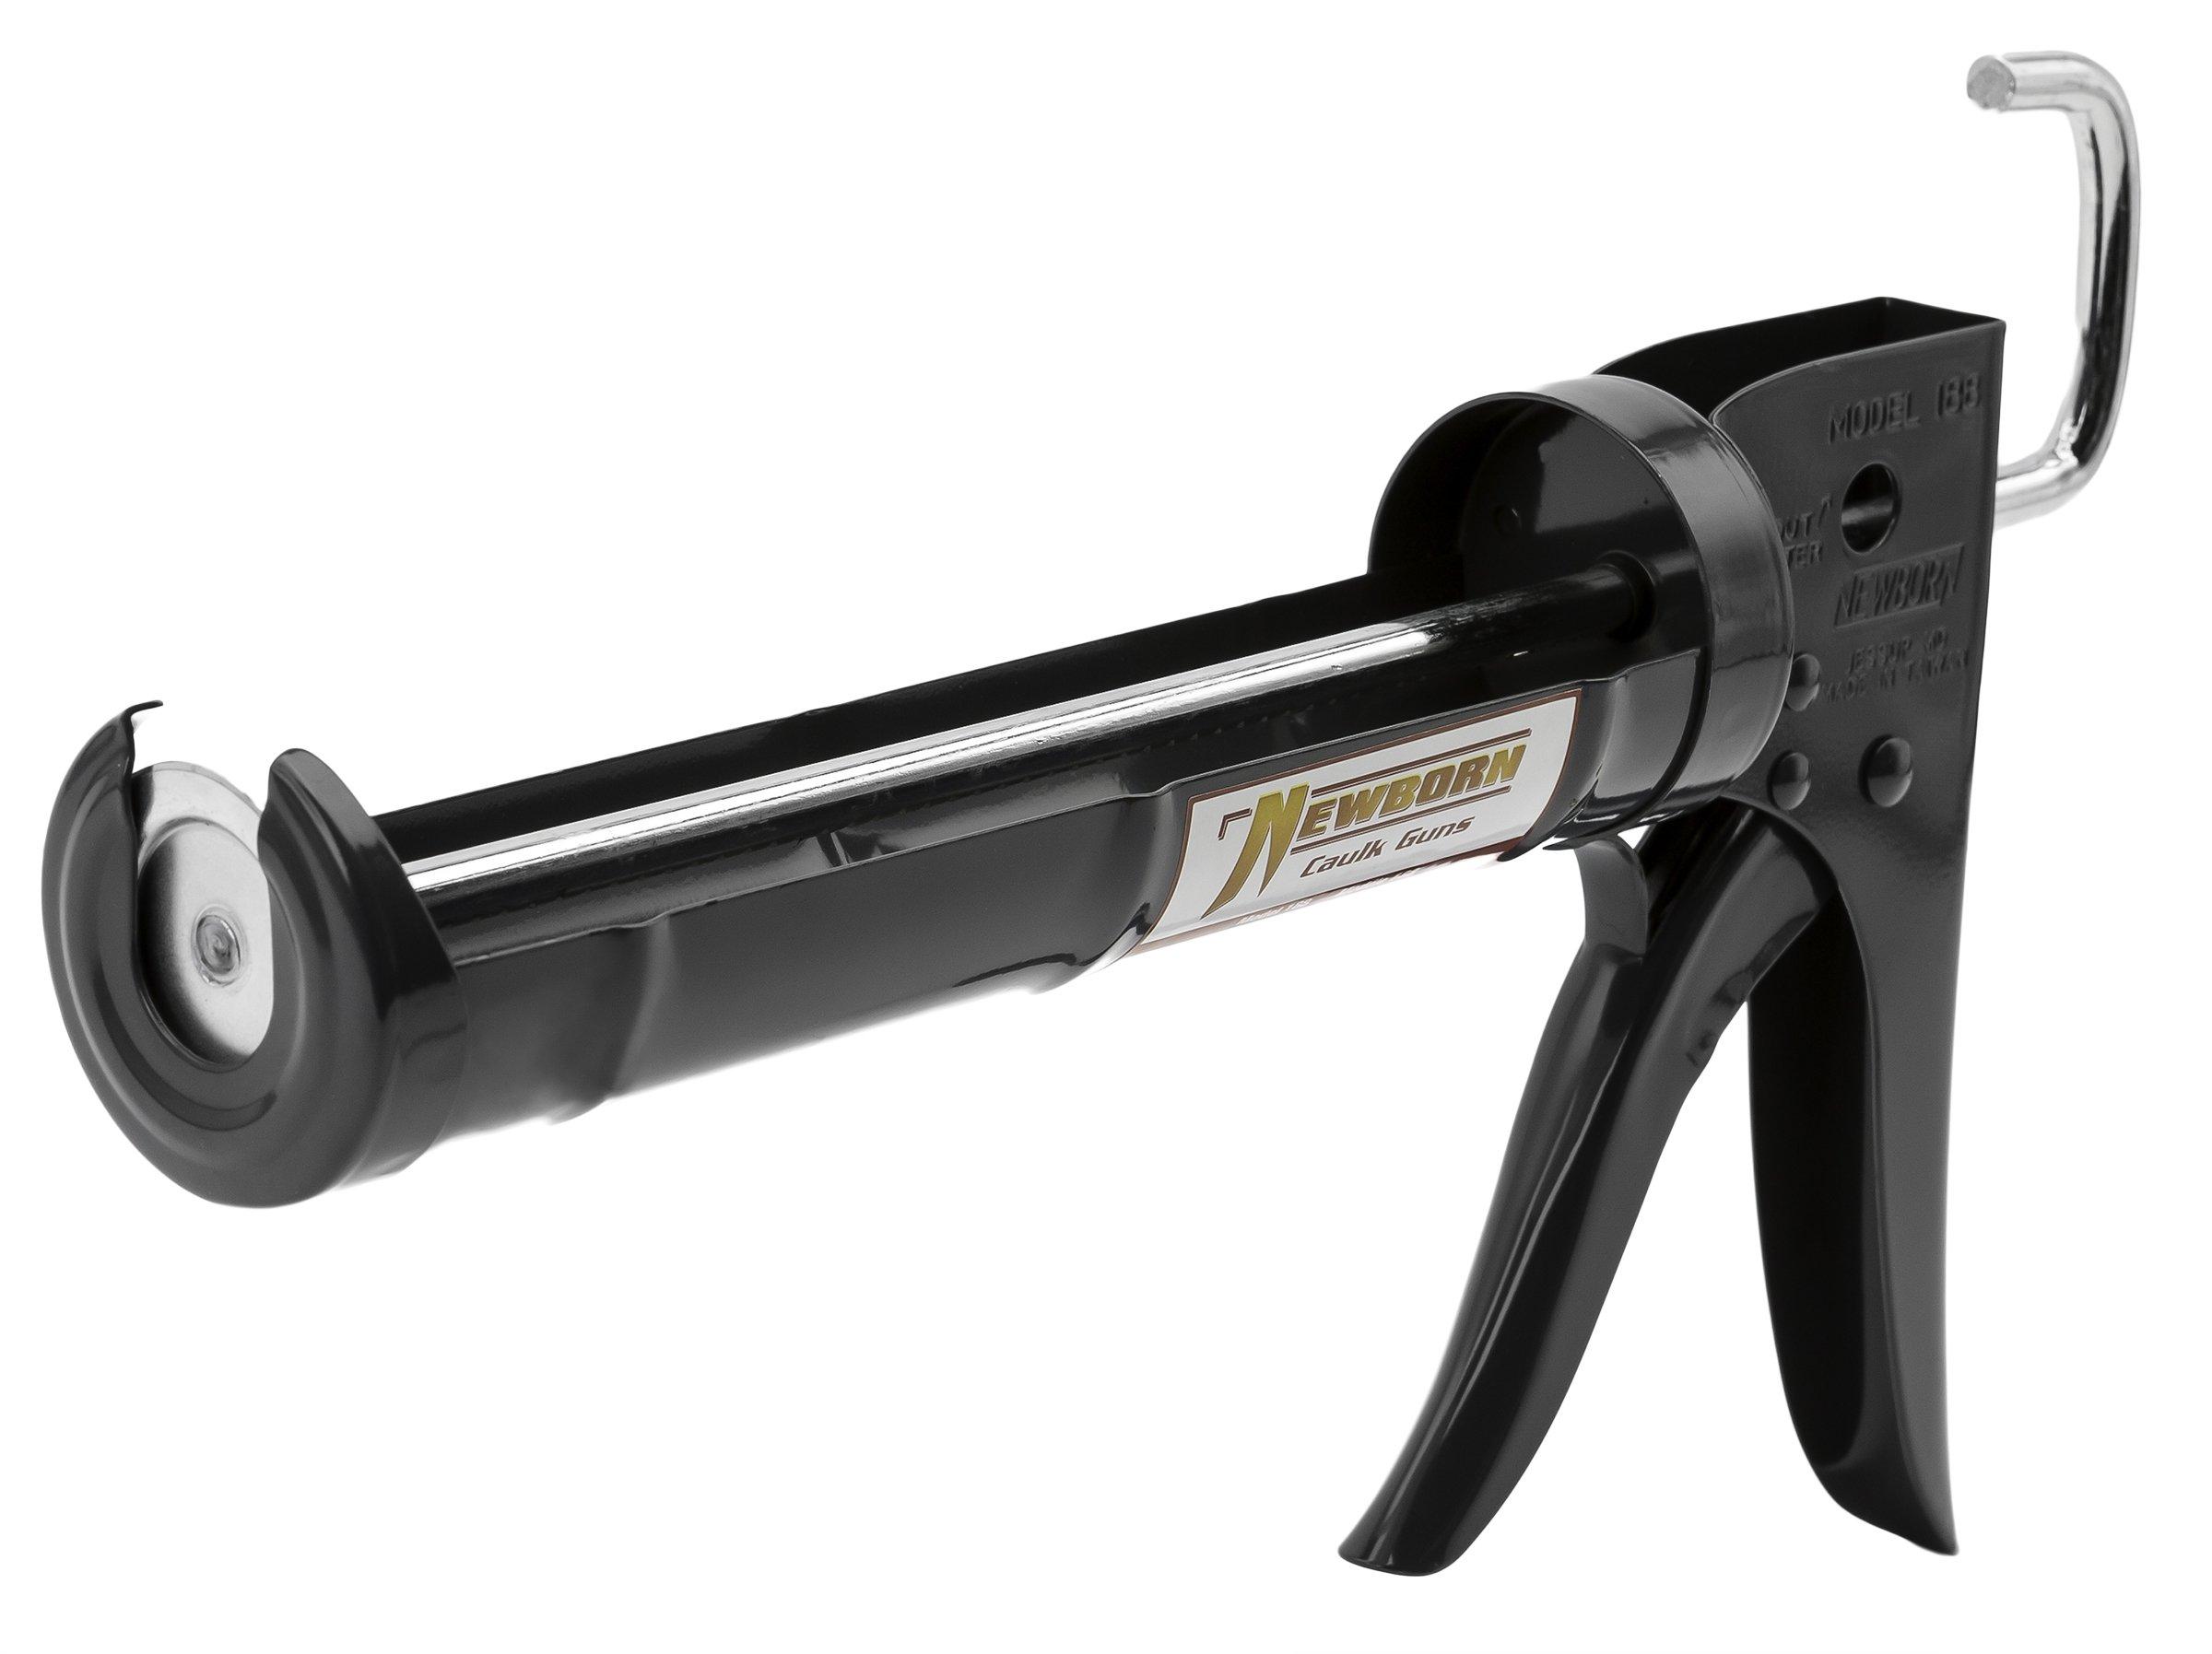 Newborn 188 Super Ratchet Rod Cradle Caulking Gun, 1/10 Gallon Cartridge, 6:1 Thrust Ratio